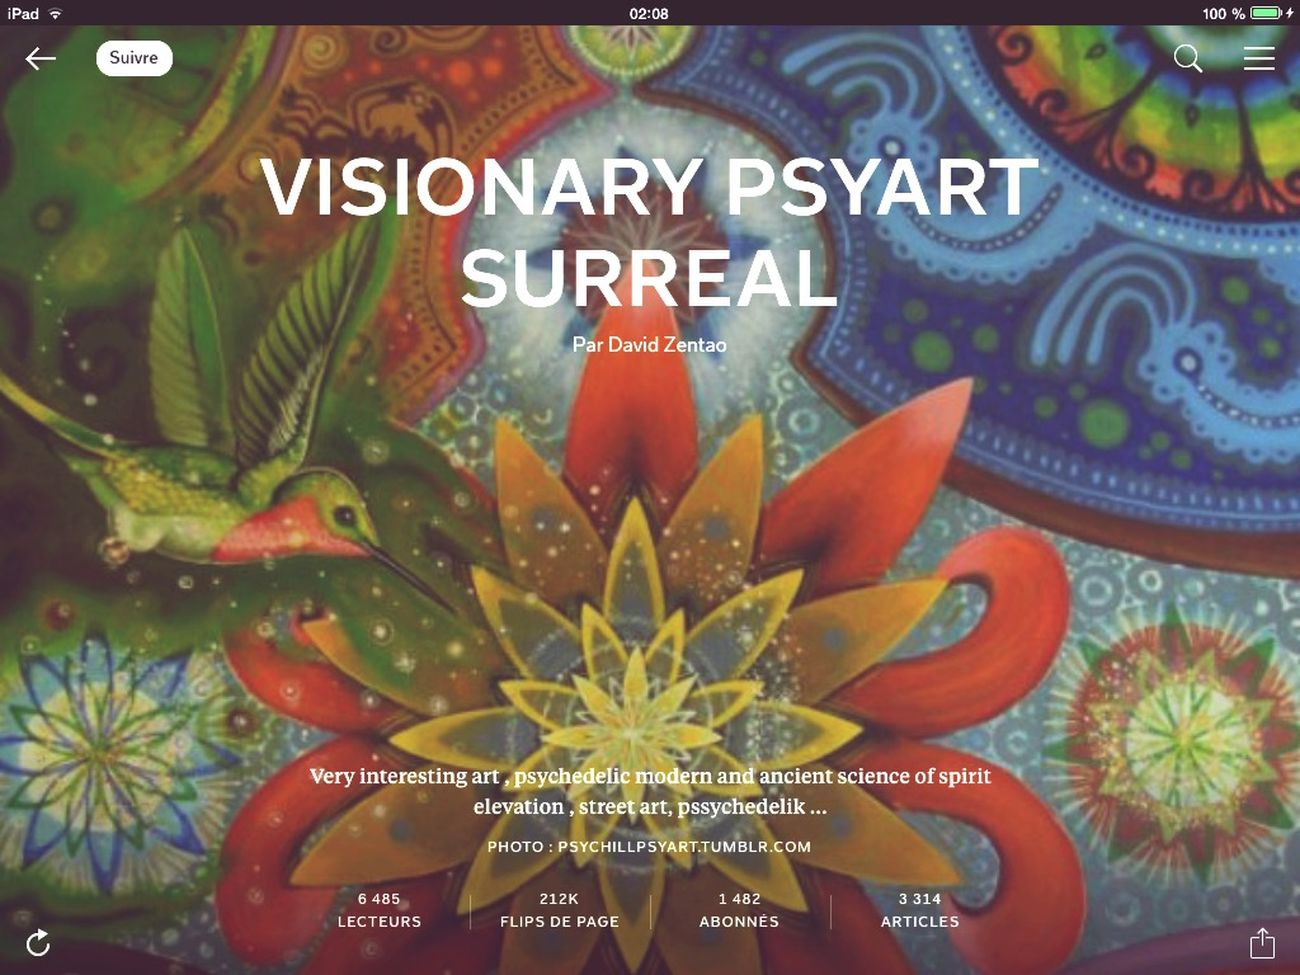 Psyart Surreal Surrealism Visionary Flipboard Webmag Davidzentao http://flip.it/2w4VY